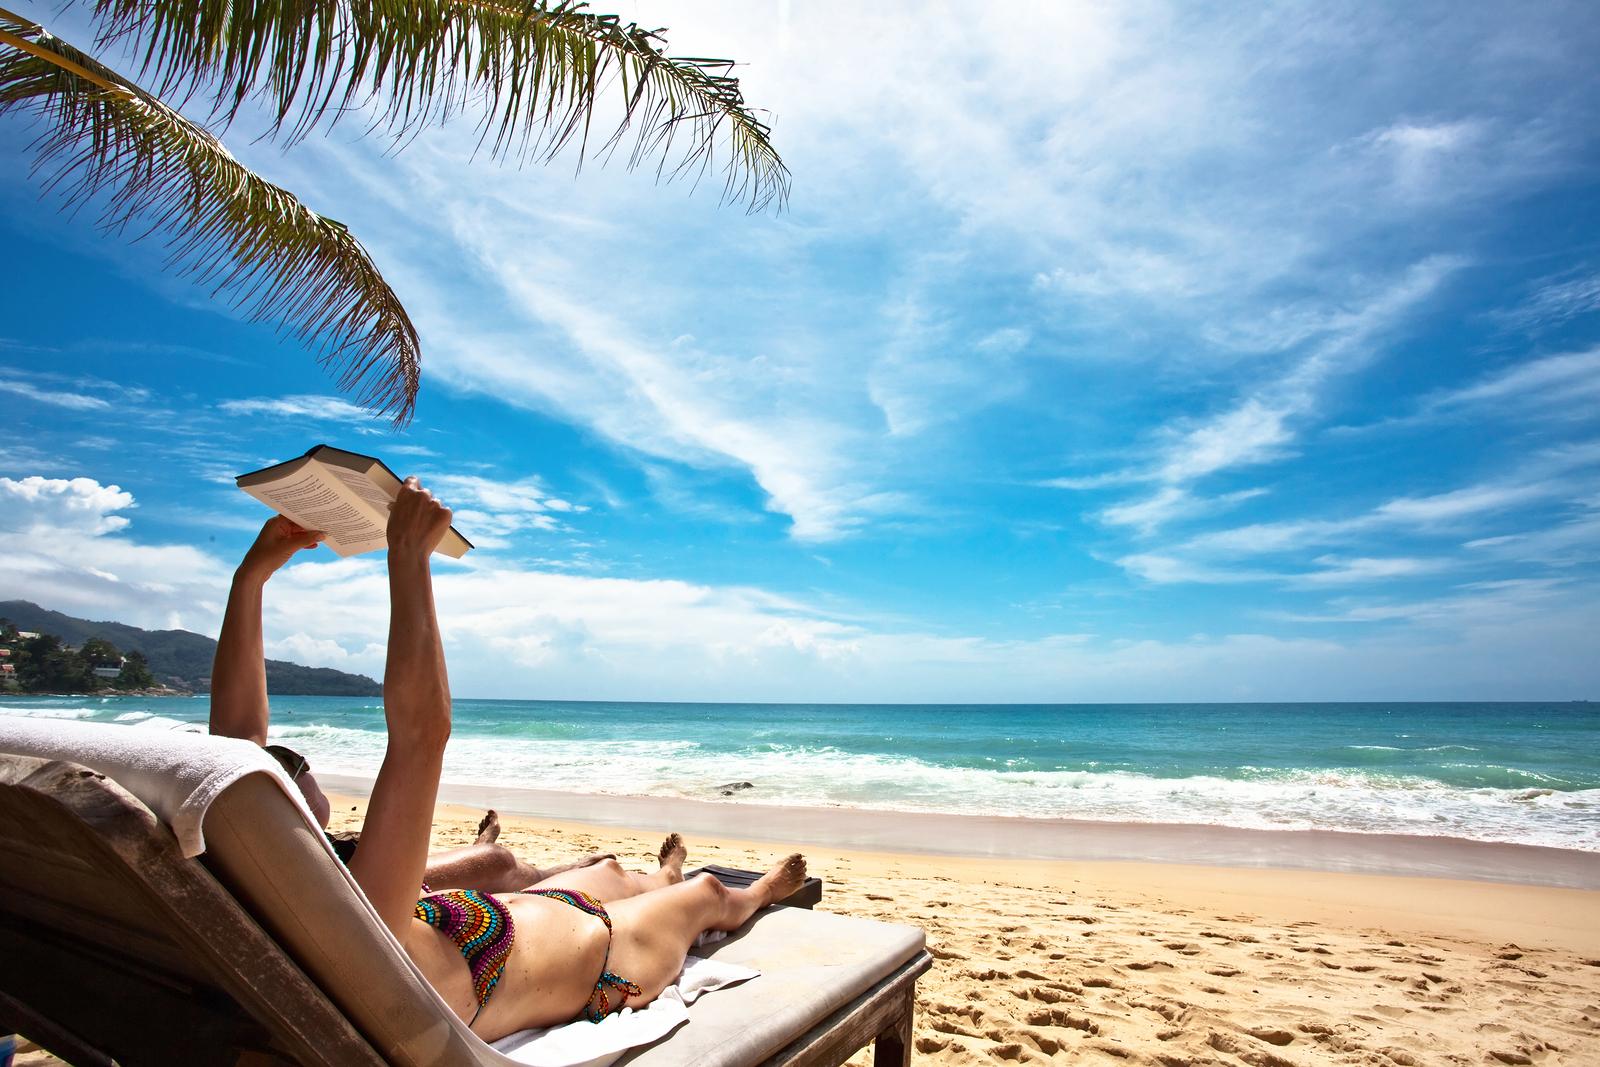 Relaxing and reading on the beach1 Must Read: Kratki romani za vrele letnje dane